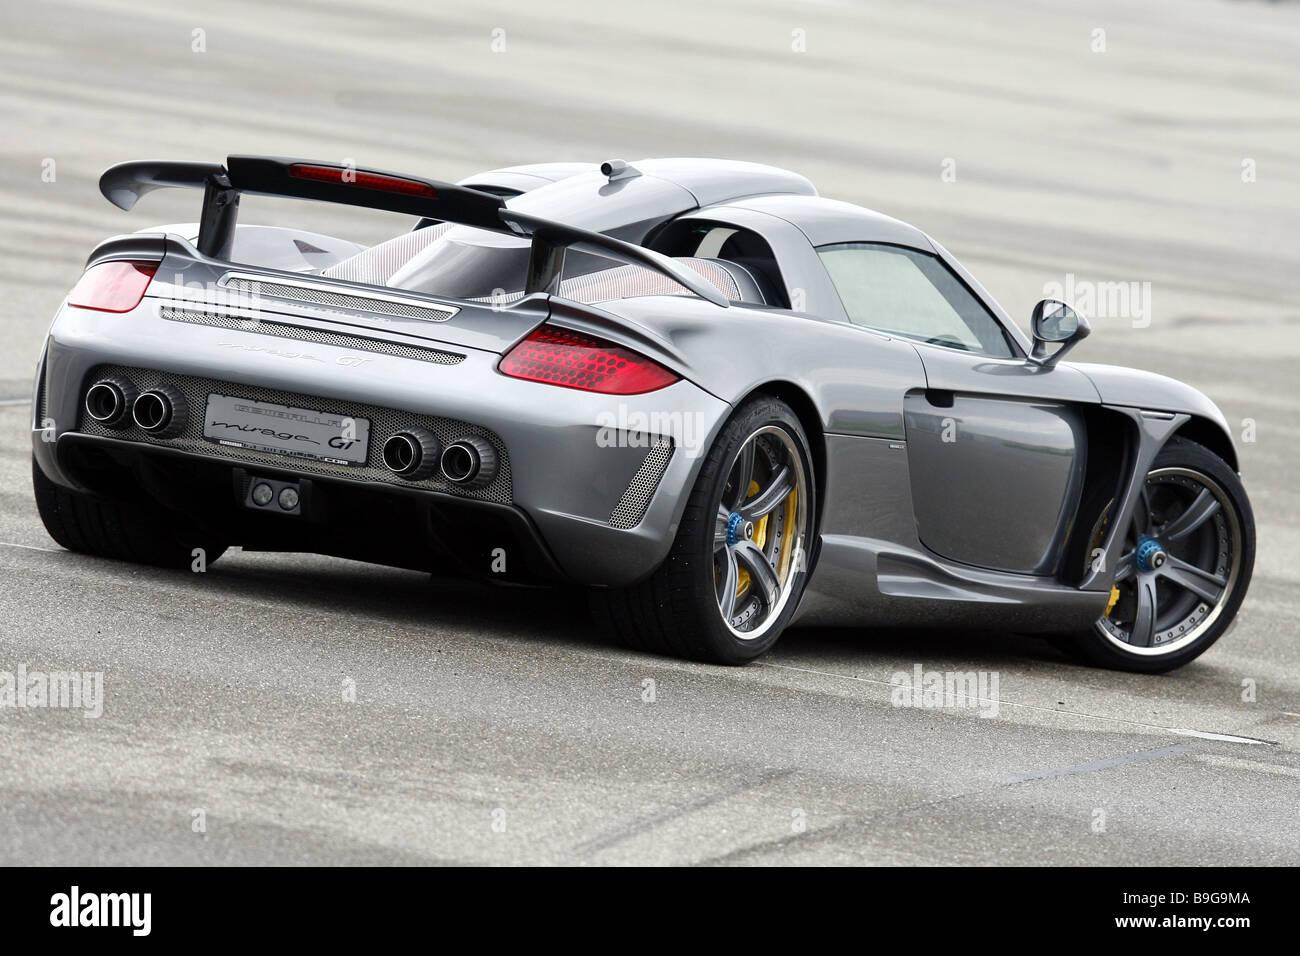 Porsche Gemballa Mirage Silver Backview Series Vehicle Car Sport